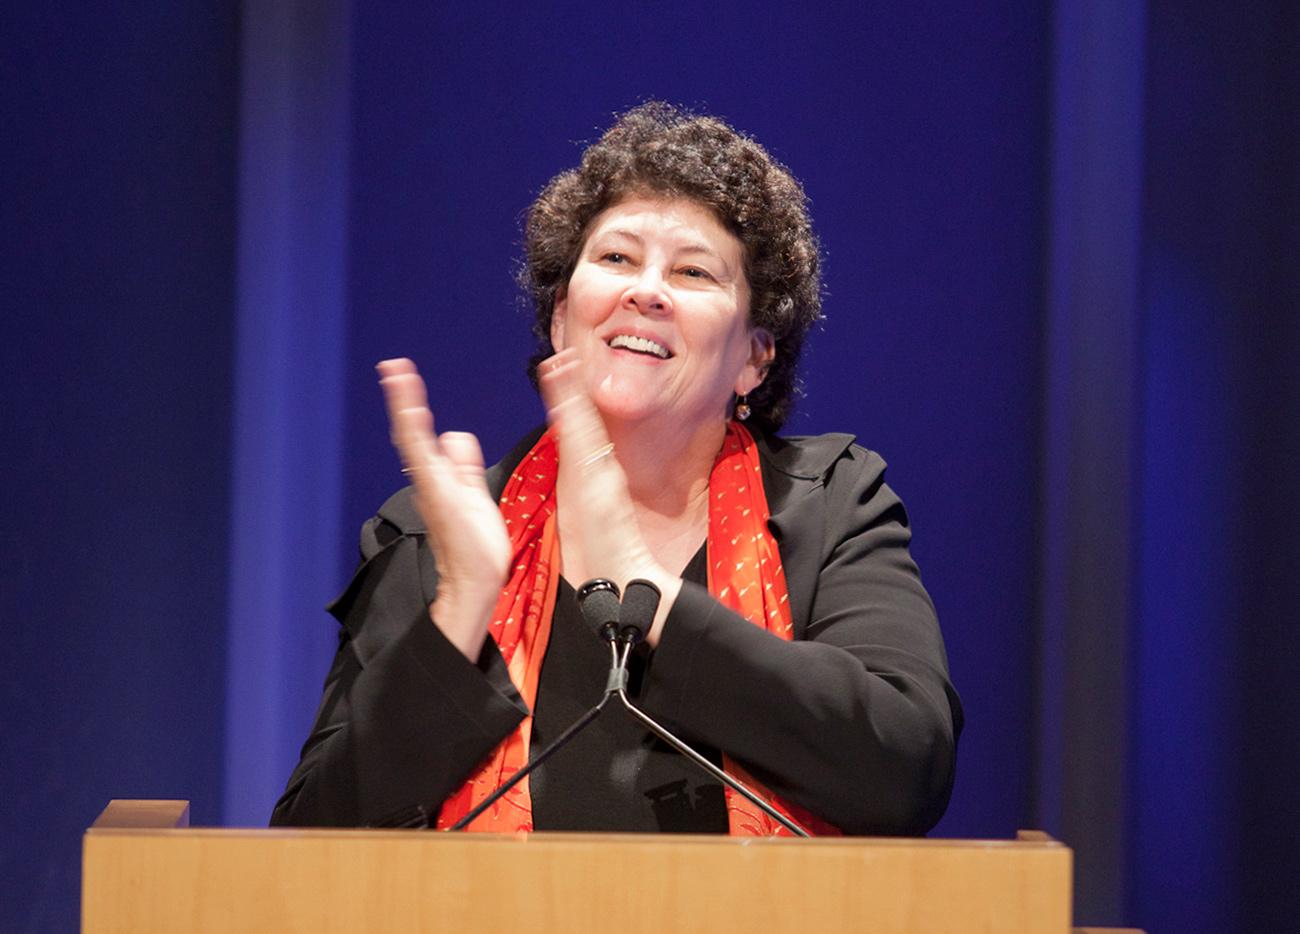 Remembering Deborah Marrow, Longtime Director of Getty Foundation